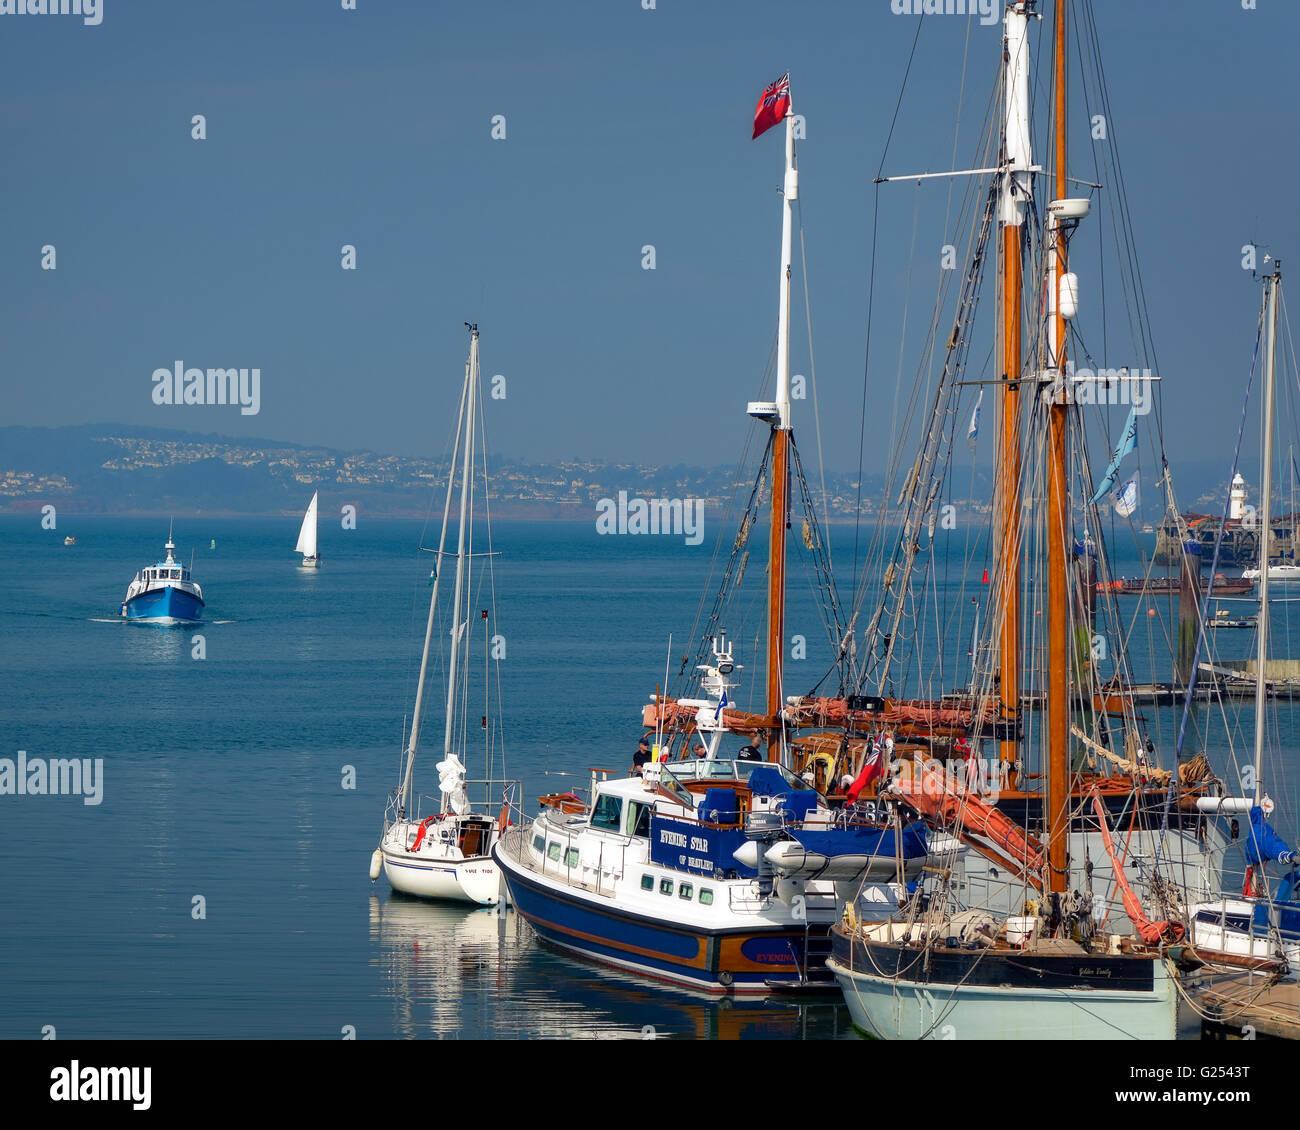 GB - DEVON: Boats at Brixham Quay - Stock Image